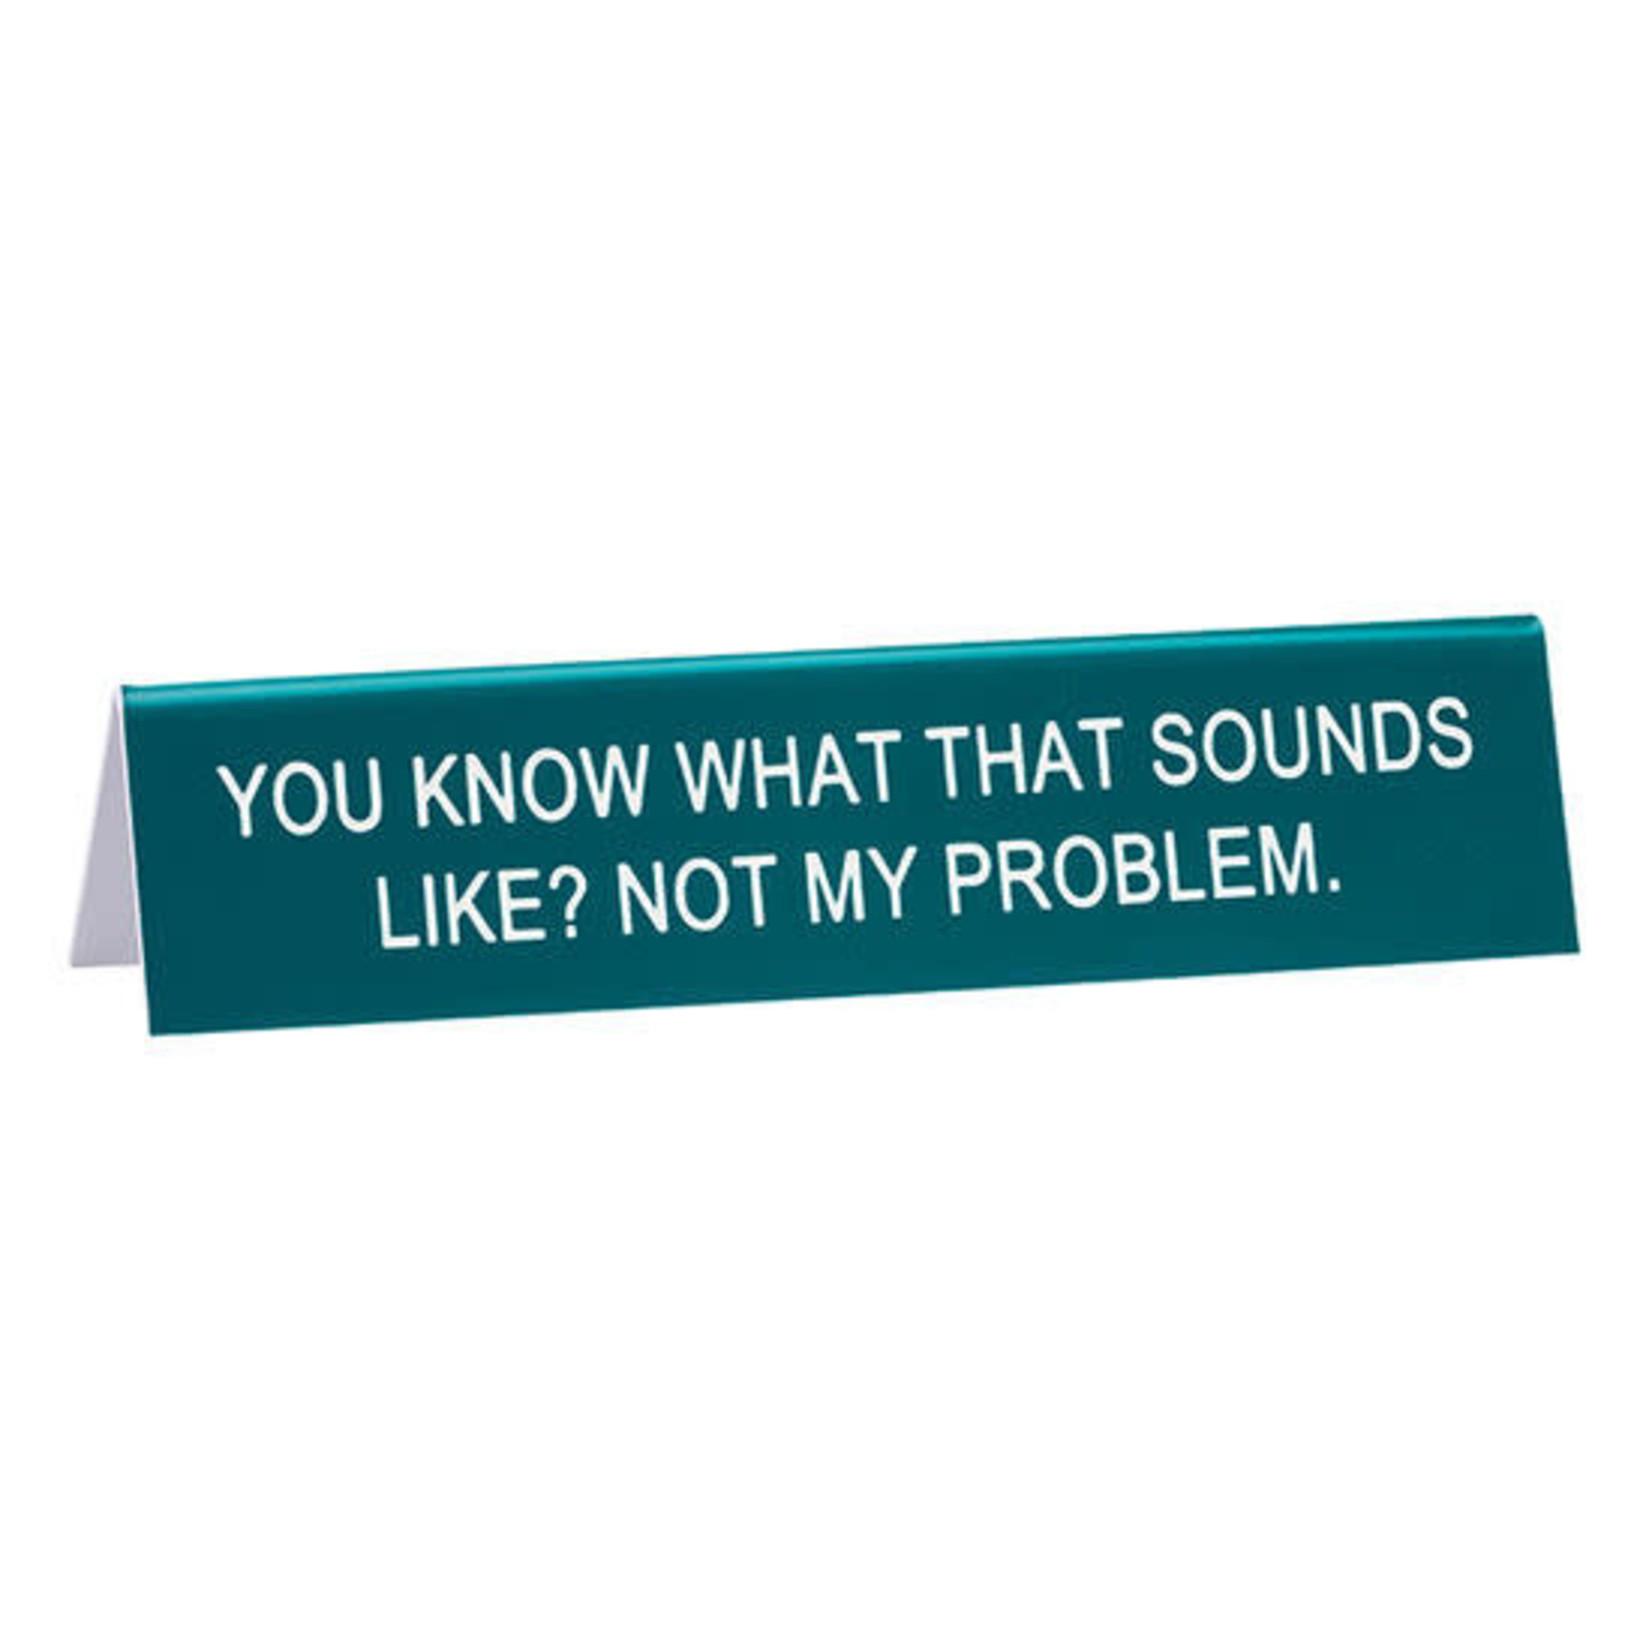 About Face Designs, Inc Snarky: Not My Problem Desk Sign